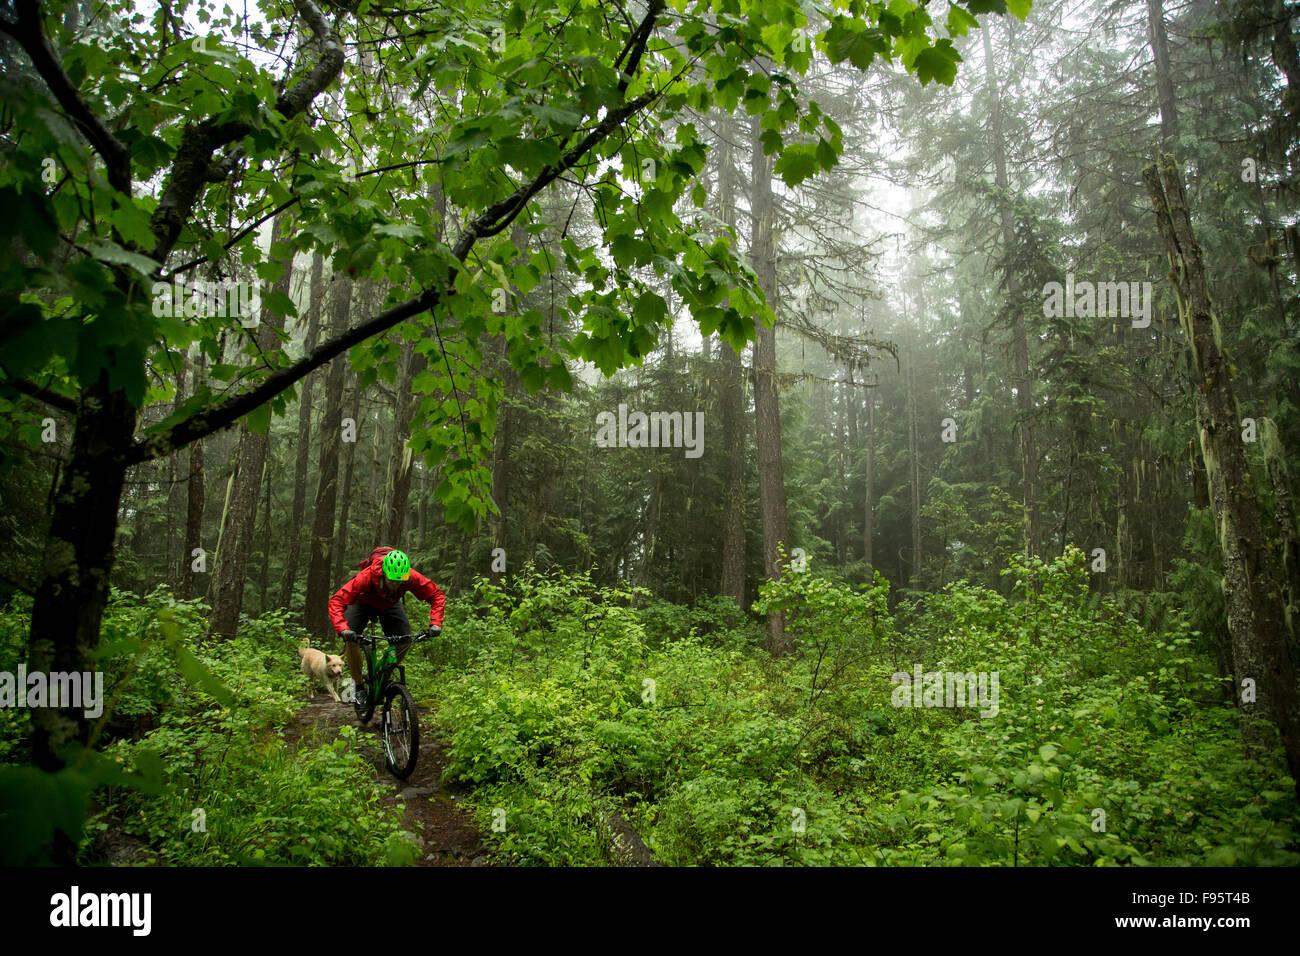 Mountain Biking, Crosscountry biking, forest, fog, Rossland, British Columbia, Canada, - Stock Image